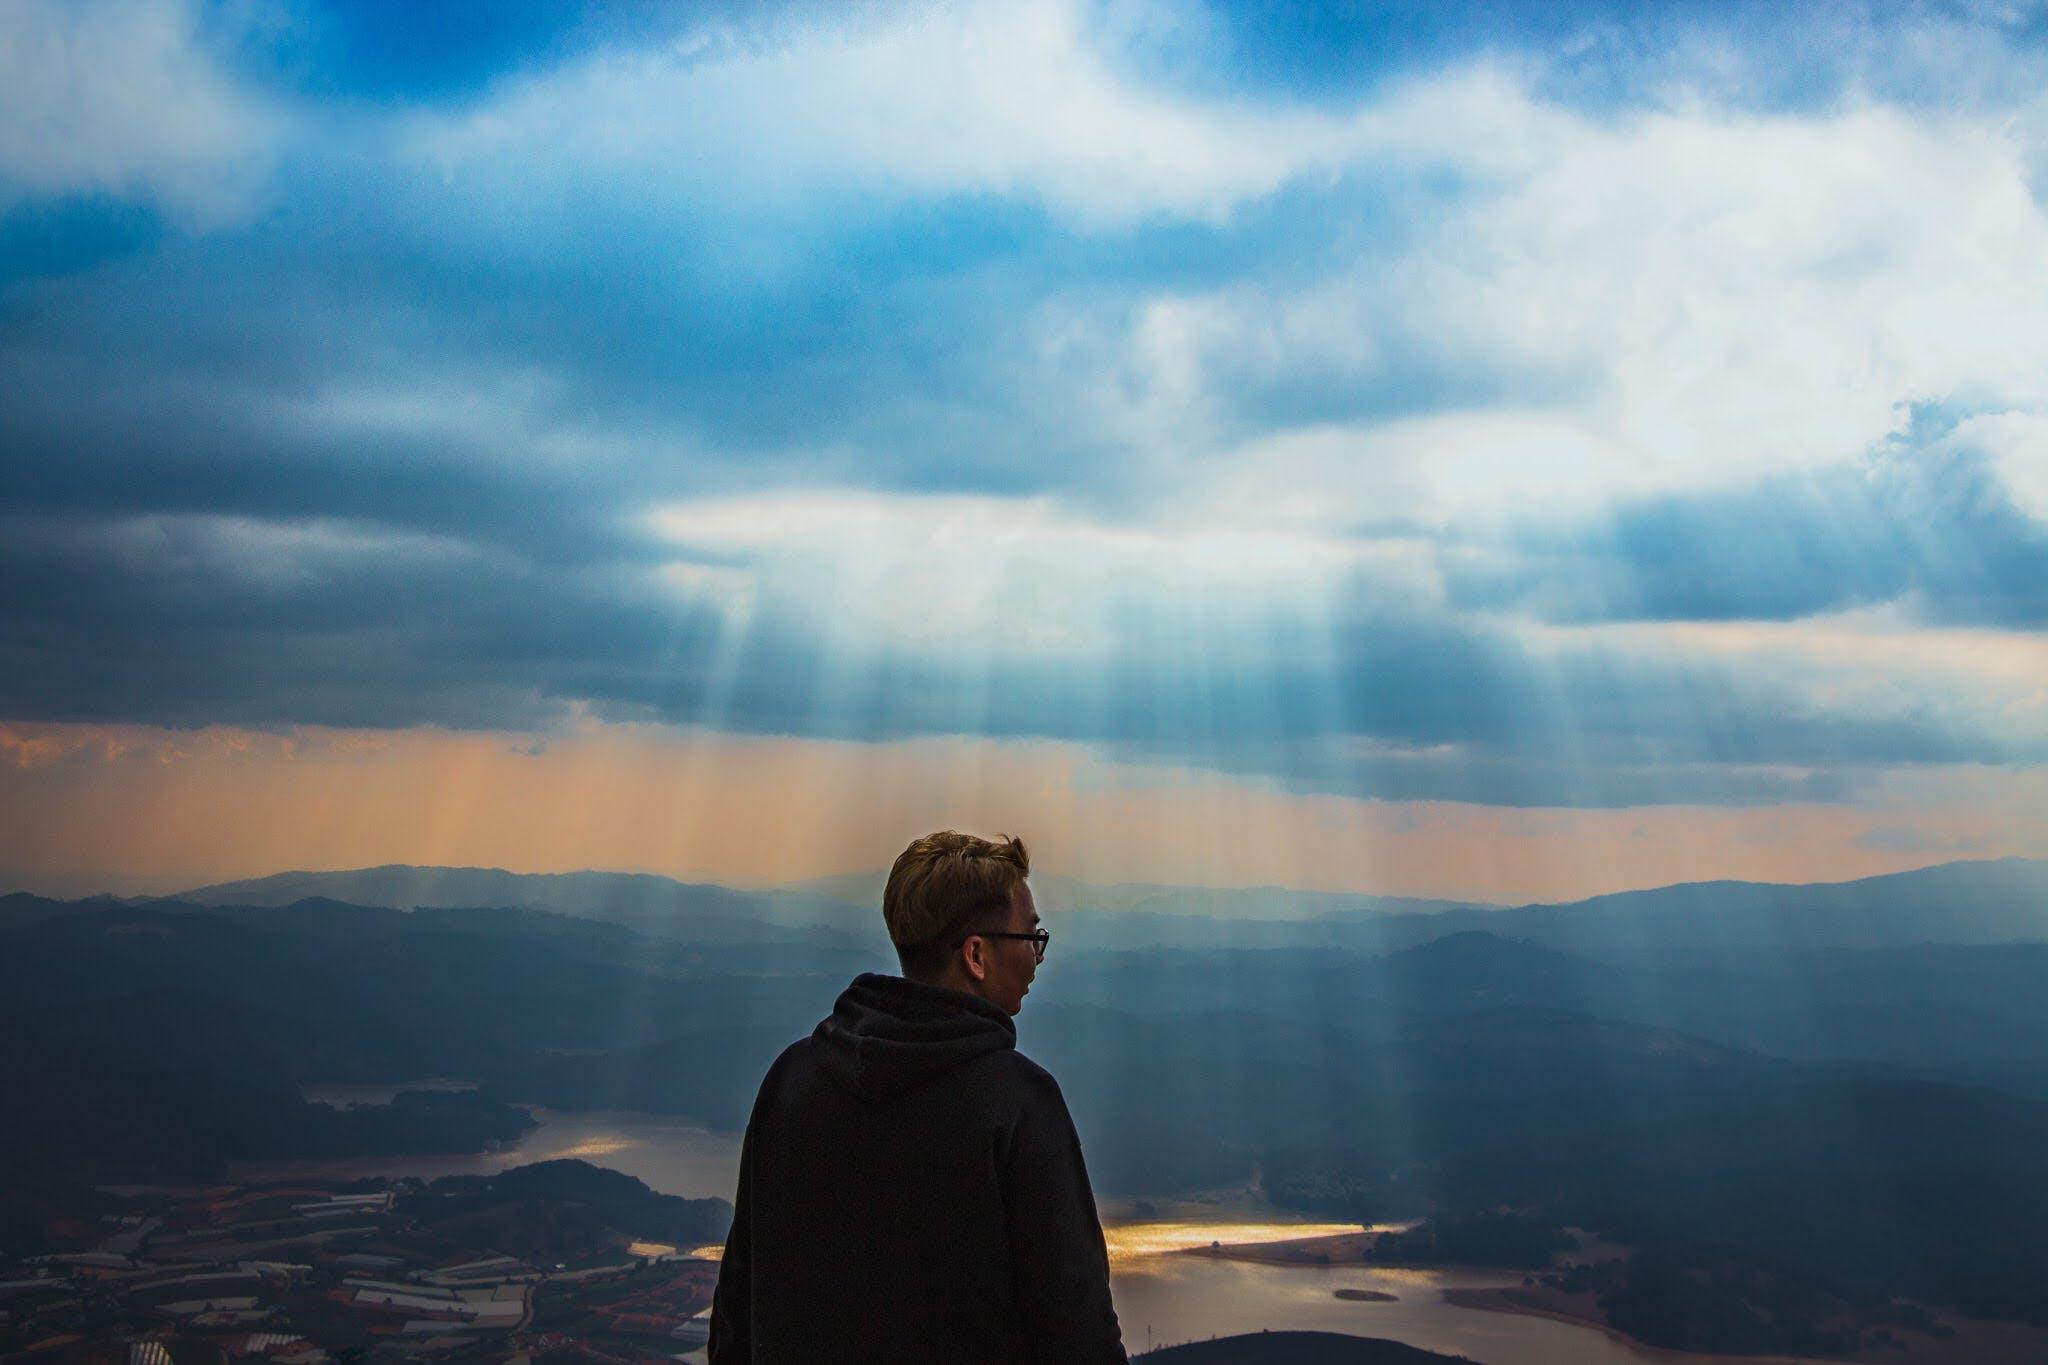 Man Wearing Black Jacket Above The Mountain